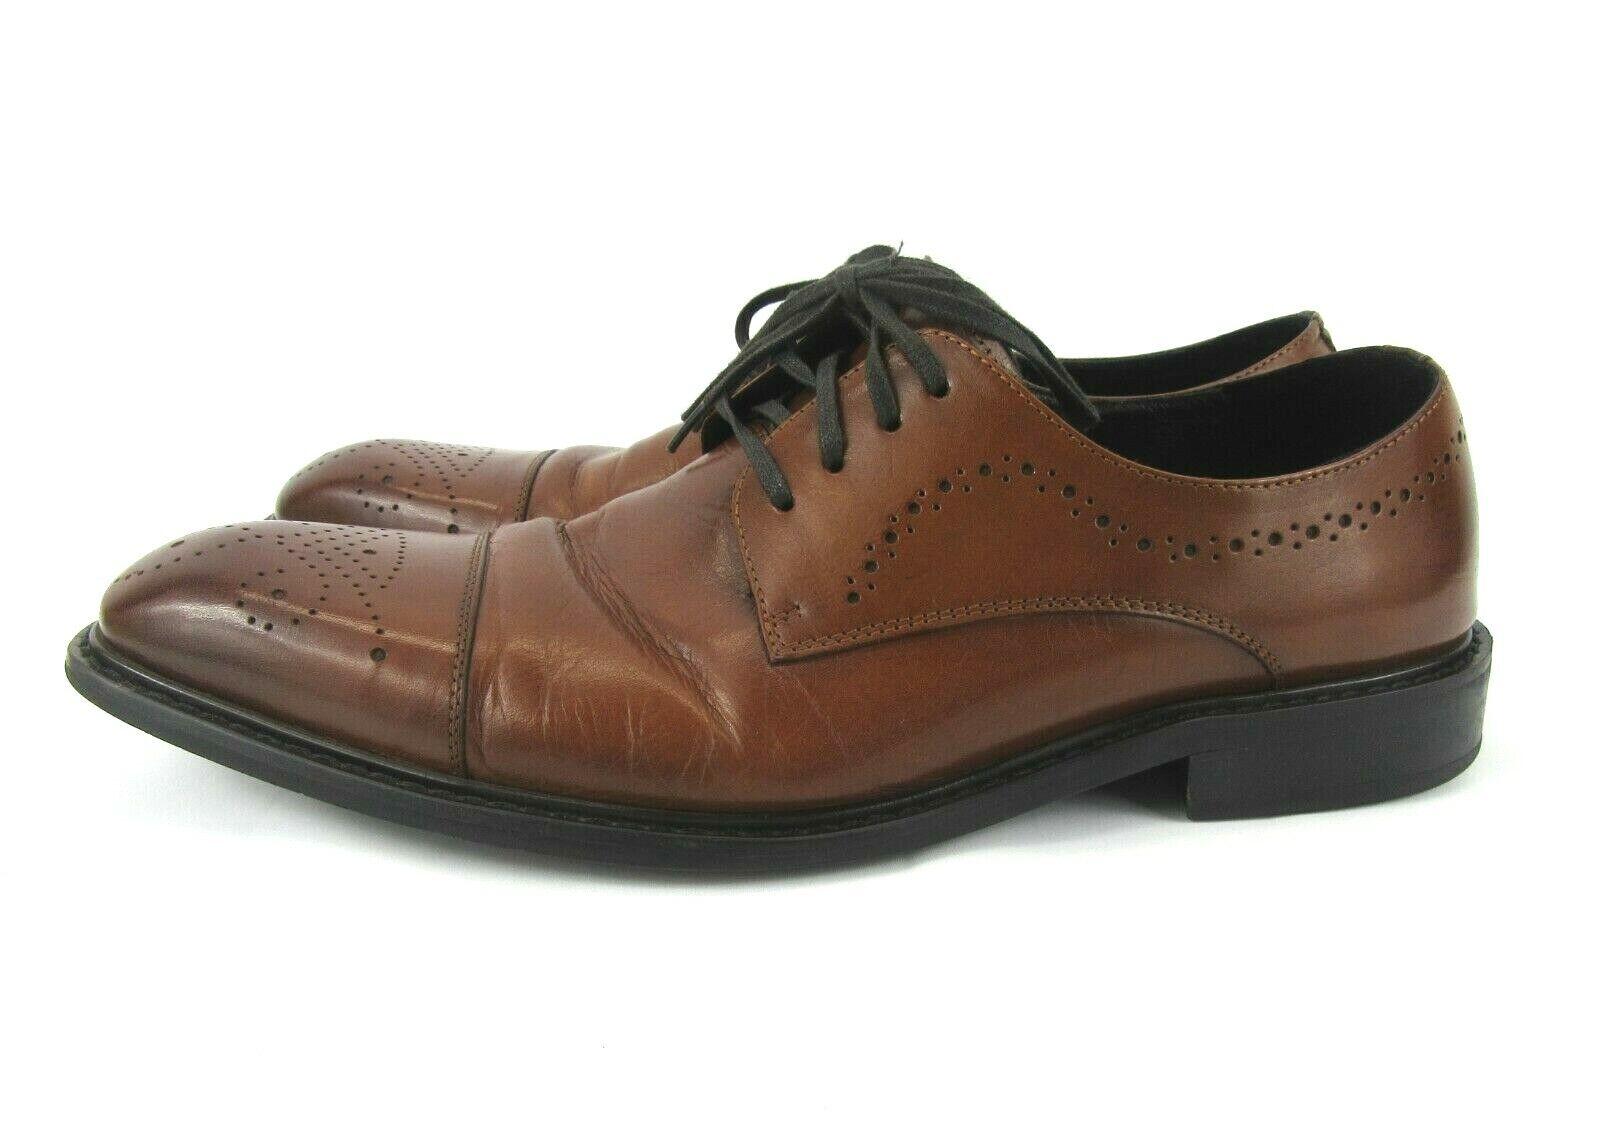 Kenneth Cole Hustle Back Mens Size 11 M Cognac Brown Lace-Up Oxford Dress Shoes